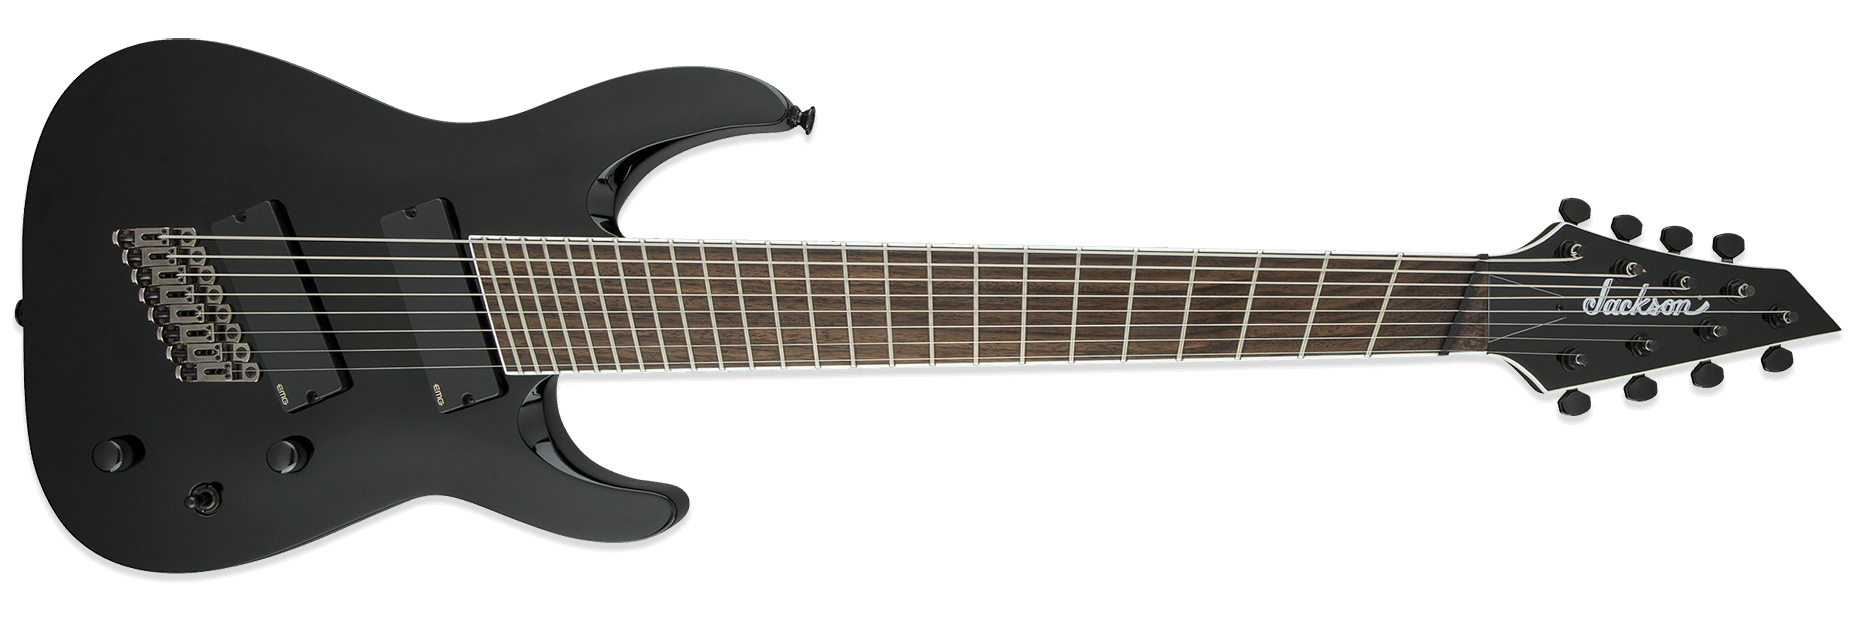 jackson-x-series-soloist-archtop-slat8-ms-gloss-black